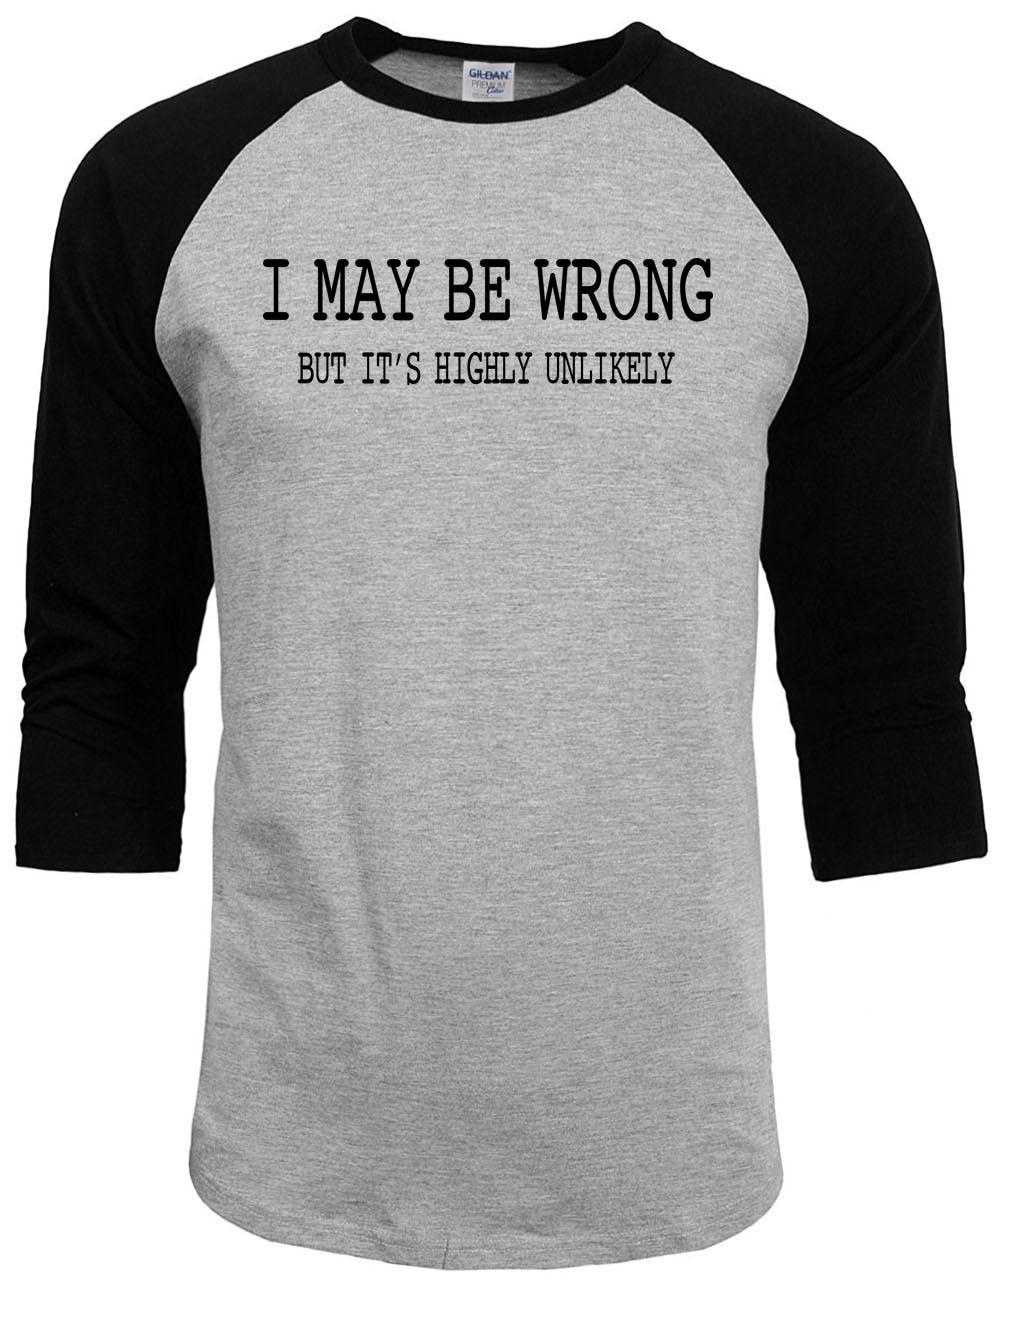 2017 new fashion t shirts Mens Funny Sayings Slogans T ...